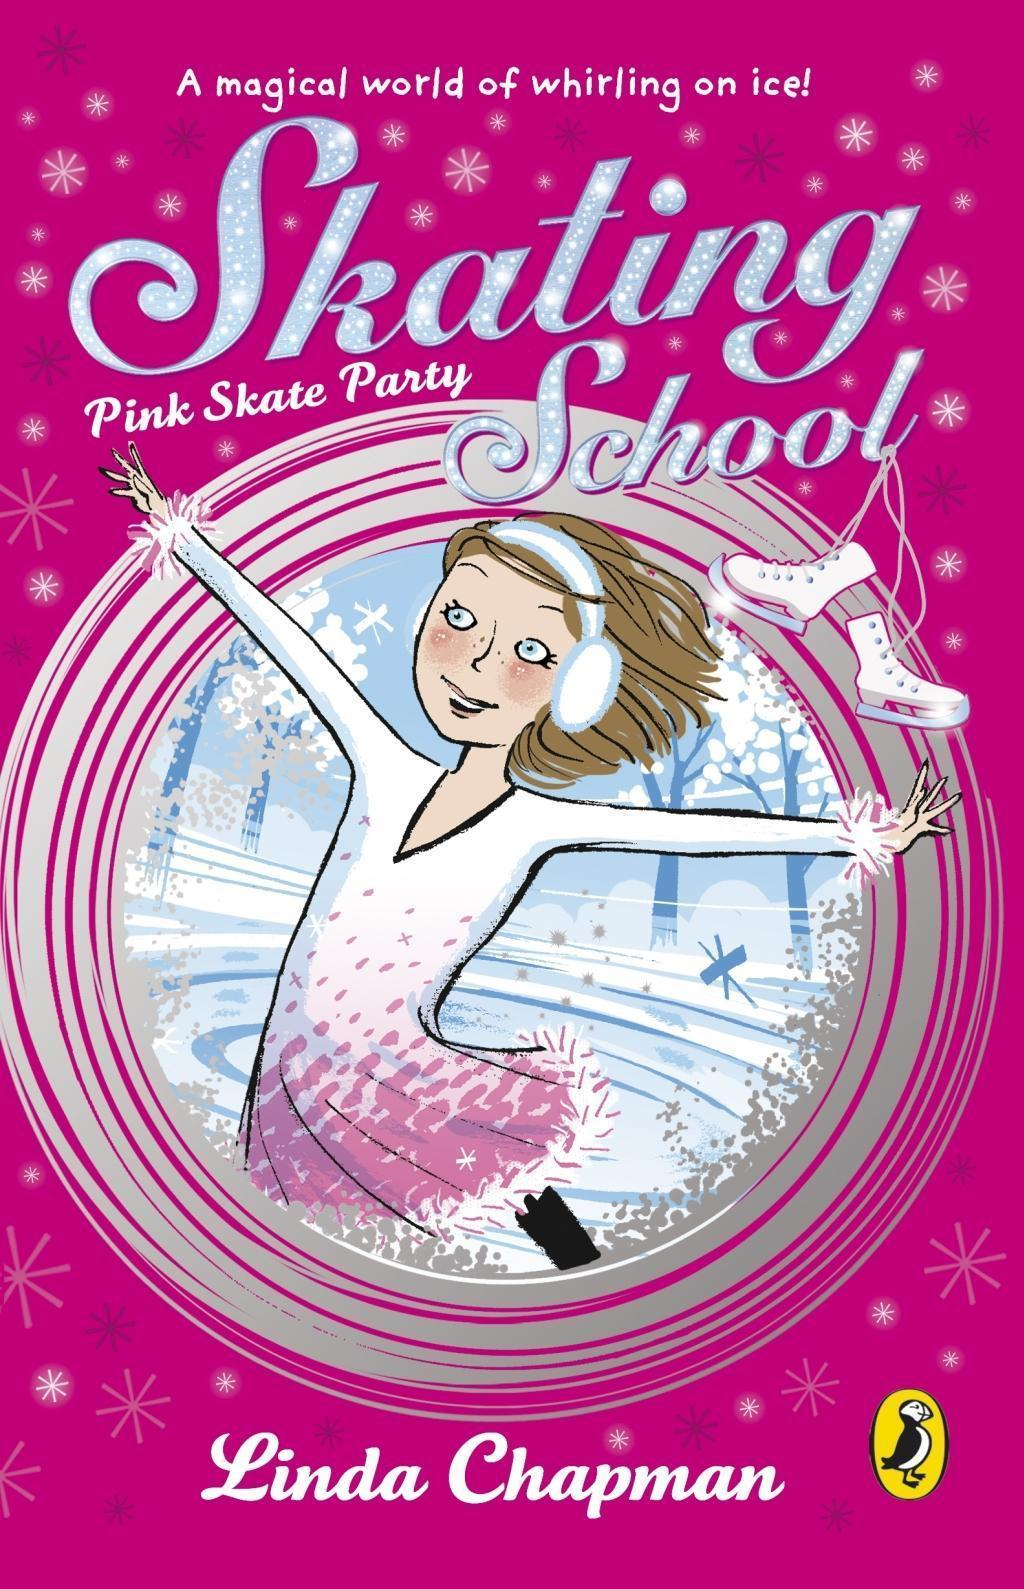 Skating School: Pink Skate Party